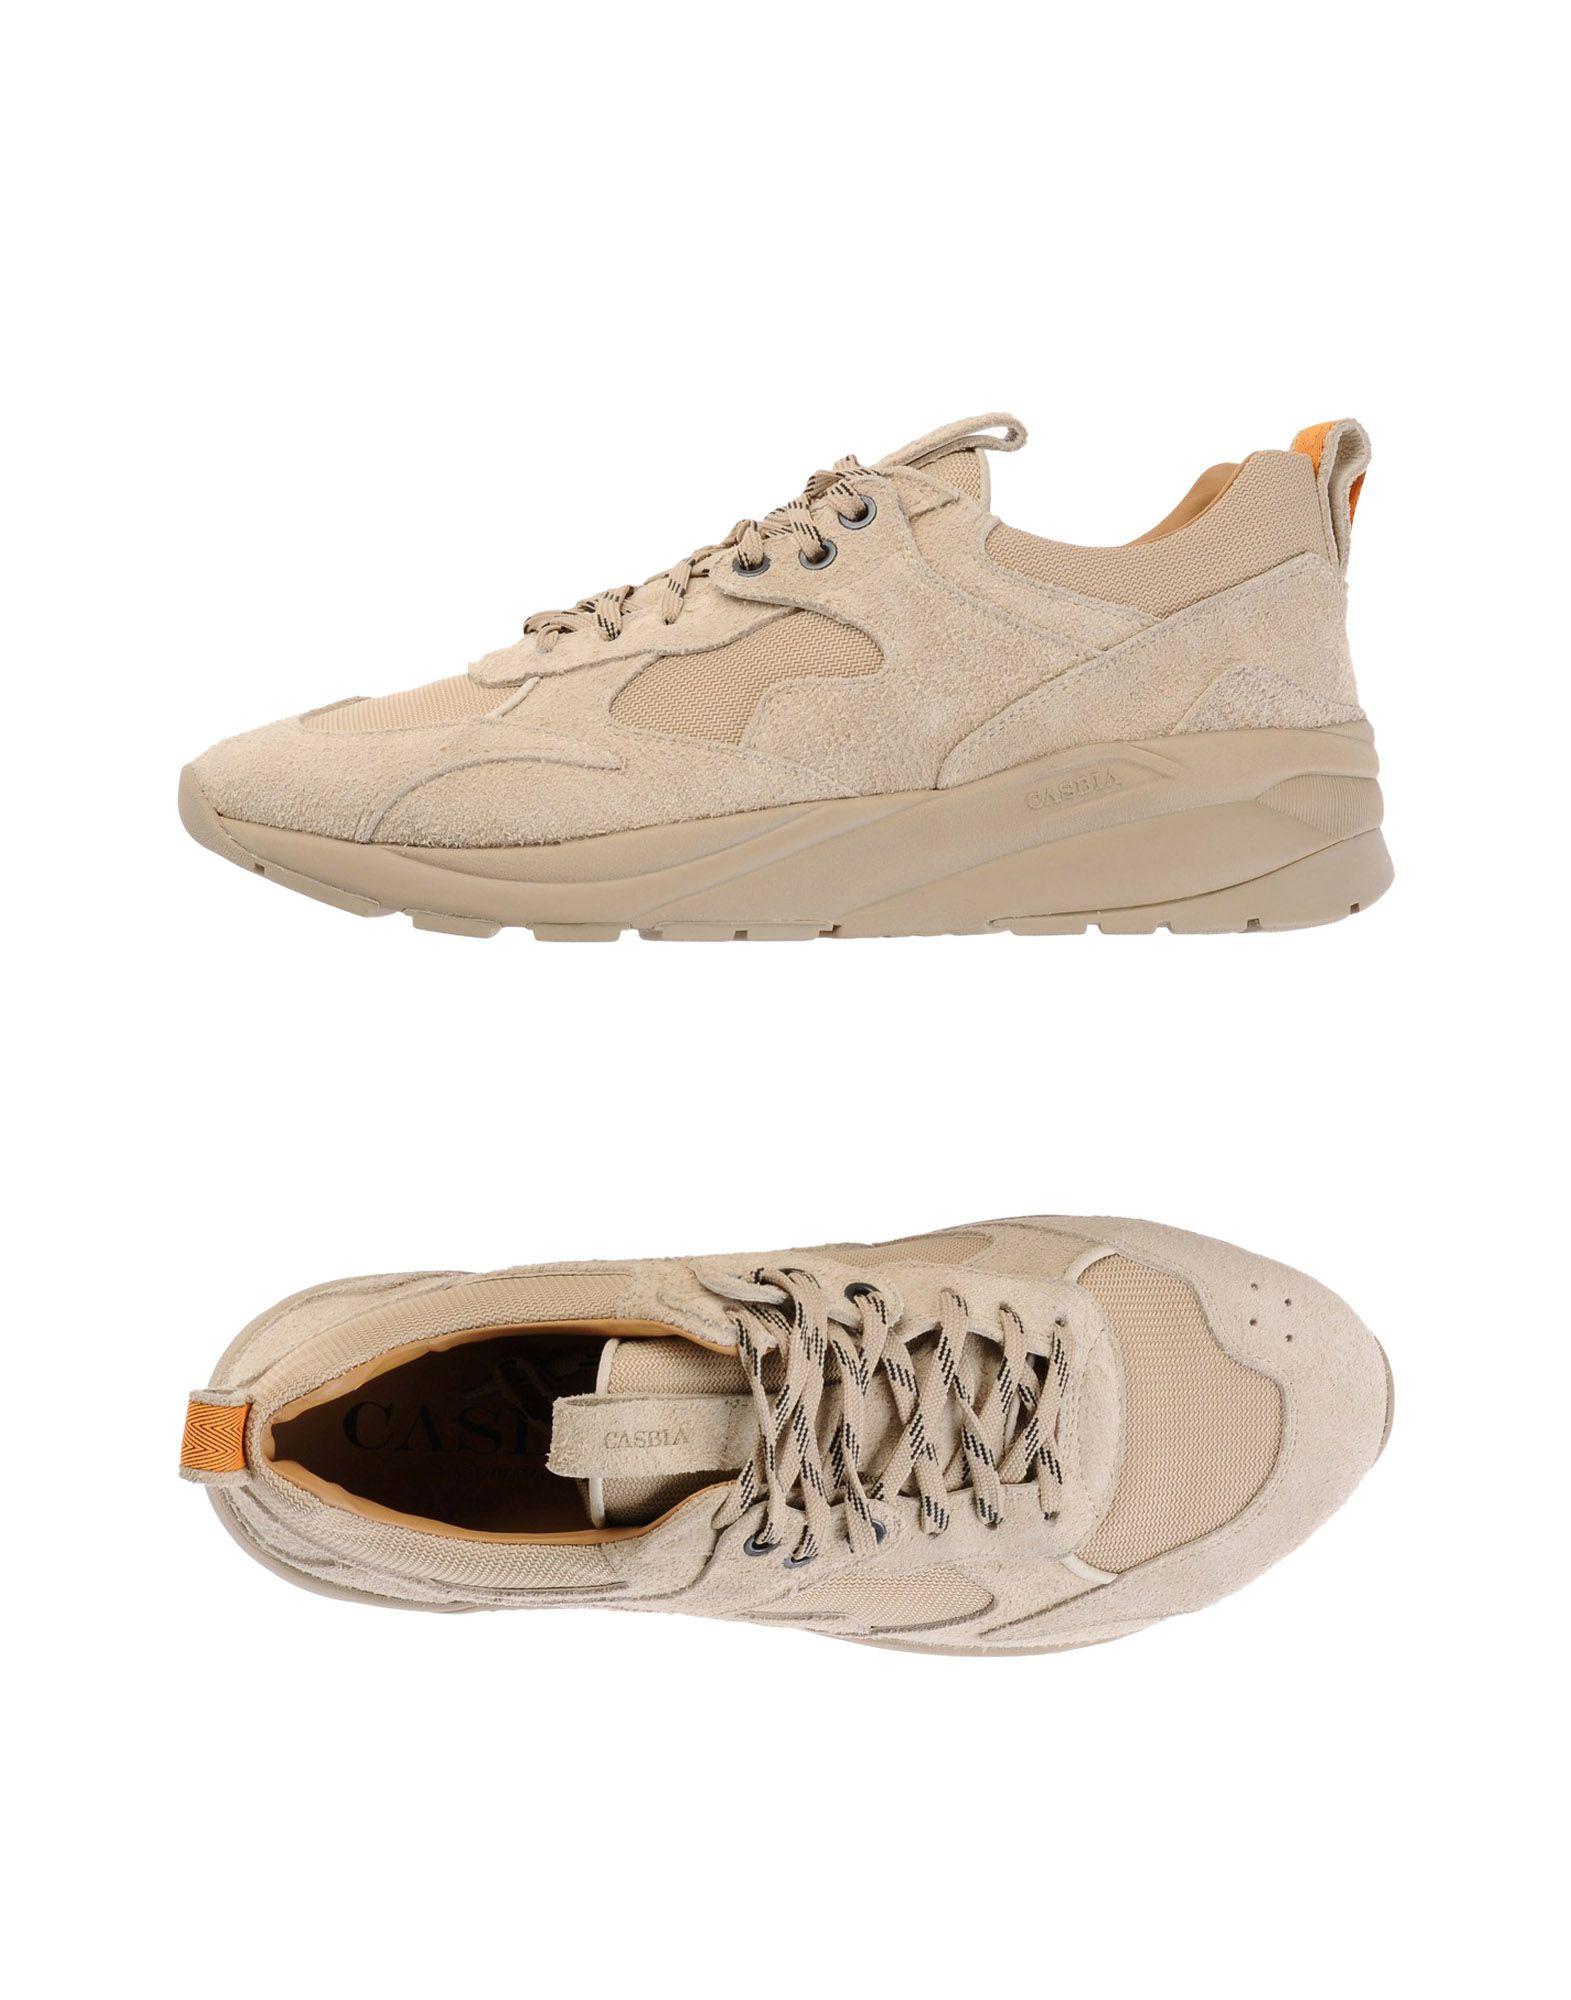 Sneakers Casbia Veloce - Uomo - 11470840FT